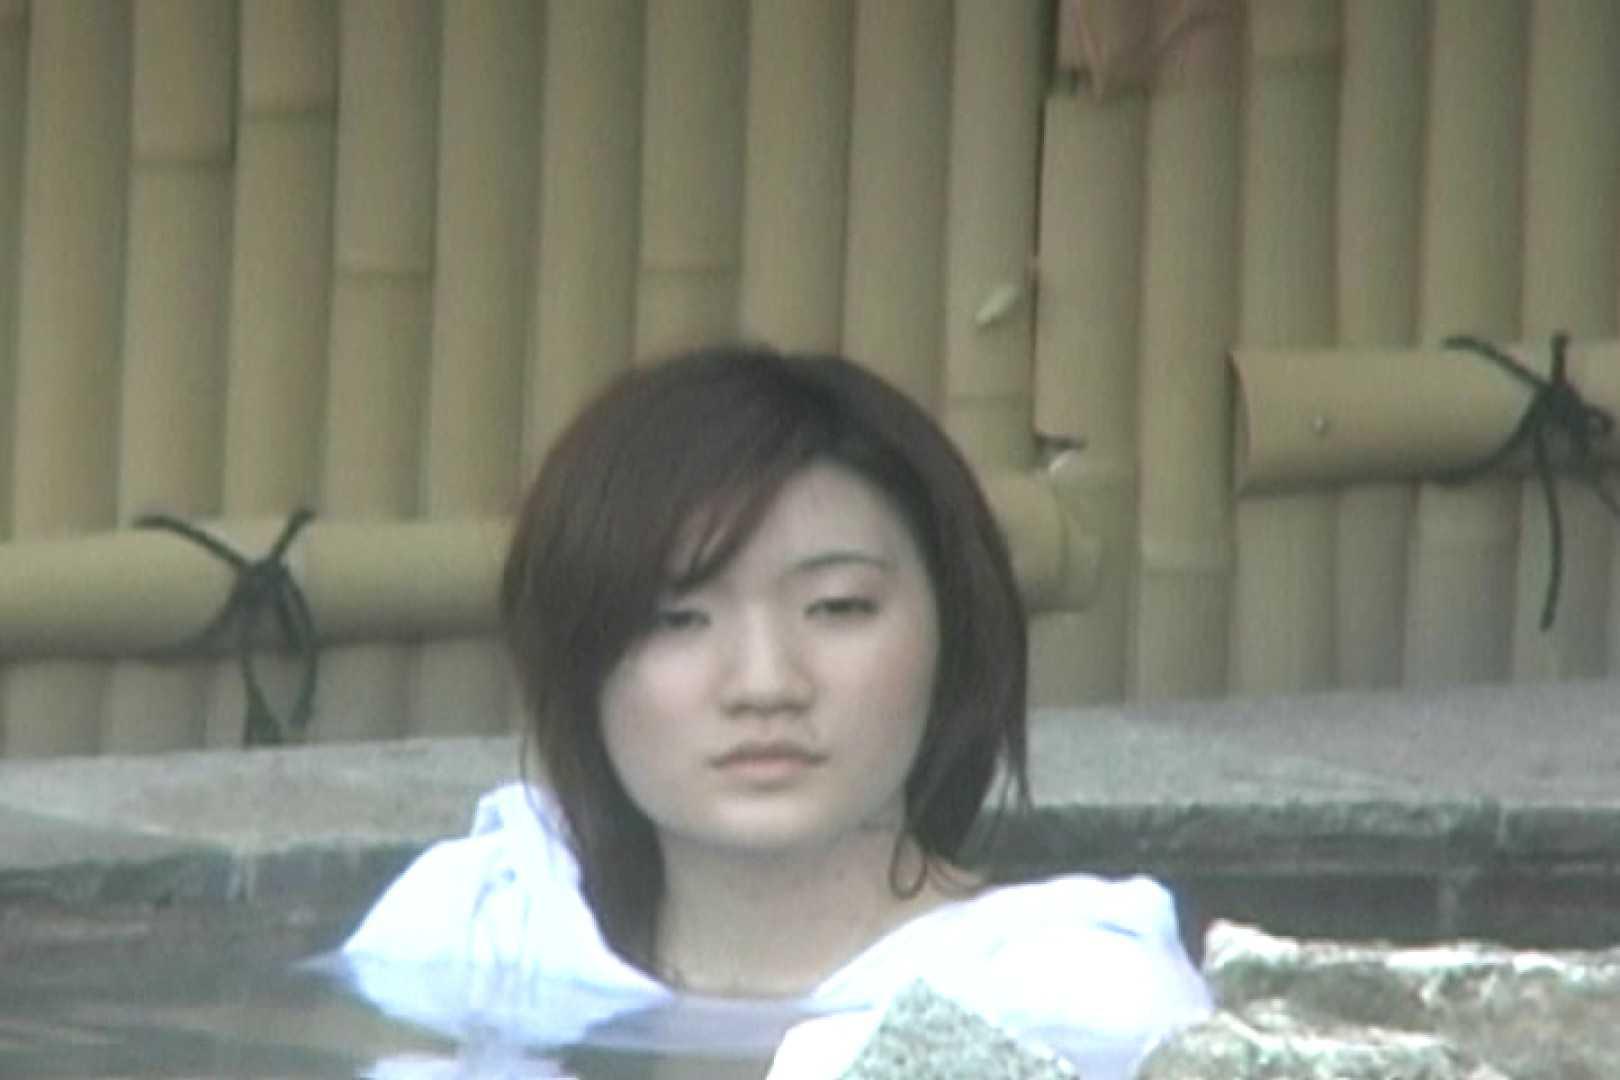 Aquaな露天風呂Vol.590 HなOL 濡れ場動画紹介 112pic 42